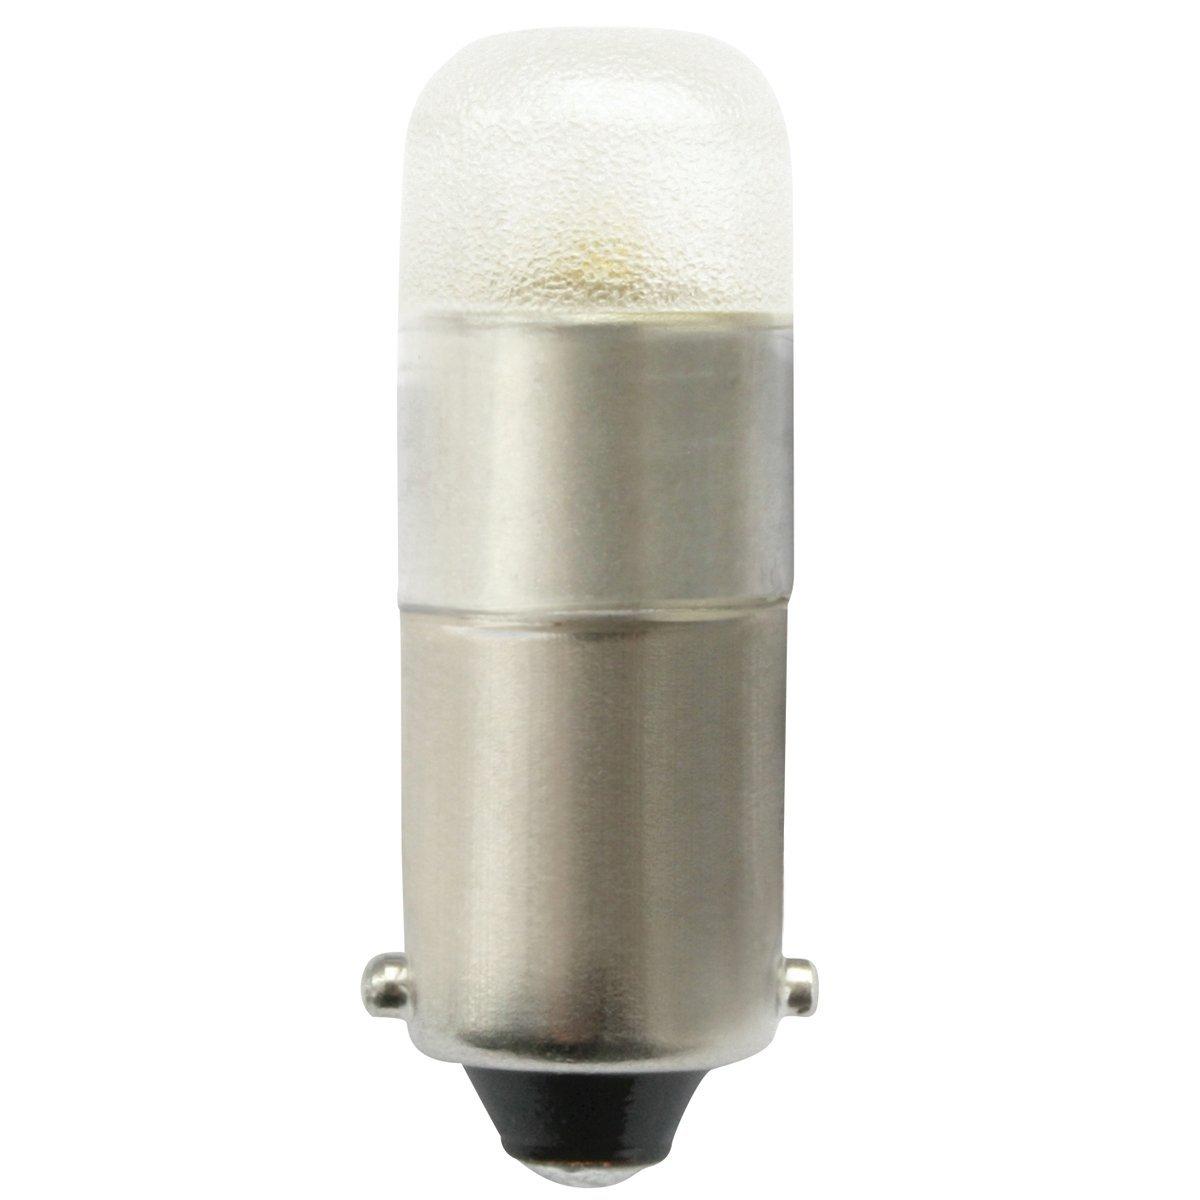 Lampa auto OSRAM 3850WW-02B LED DRIVE T4W 12V 1W